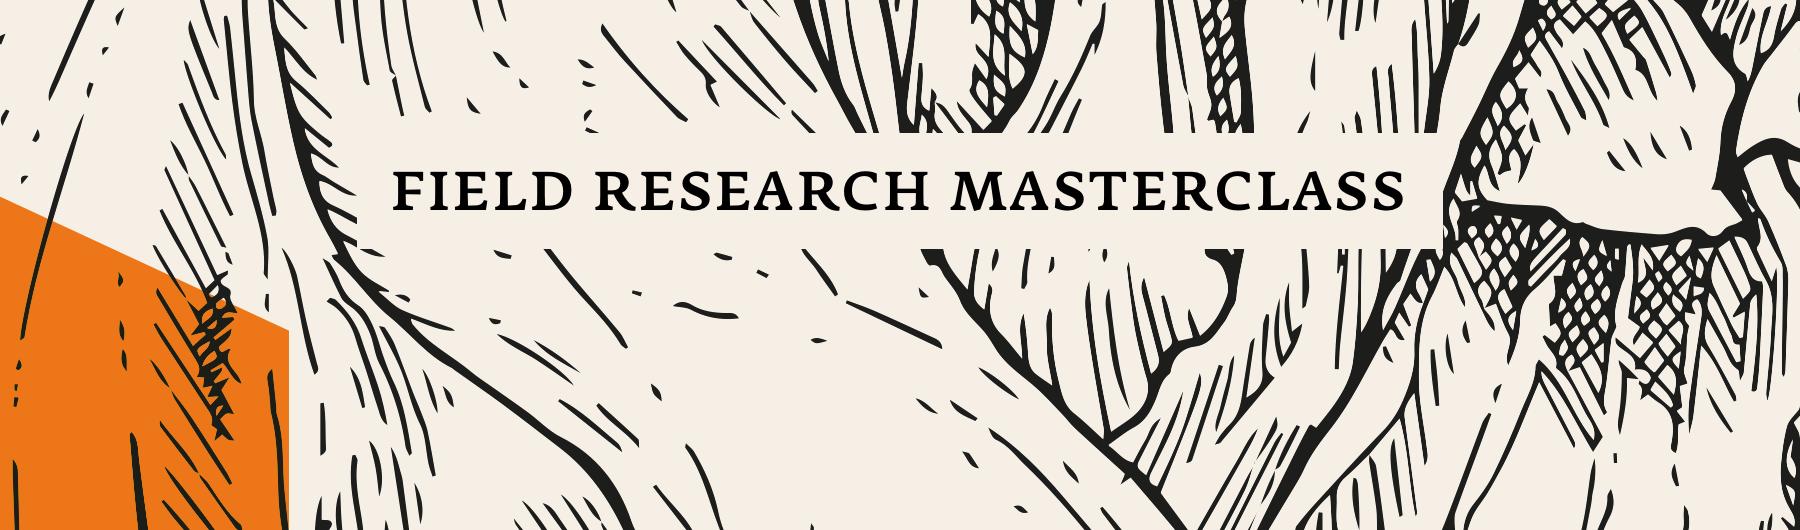 April 26, Field Research Masterclass, Singapore